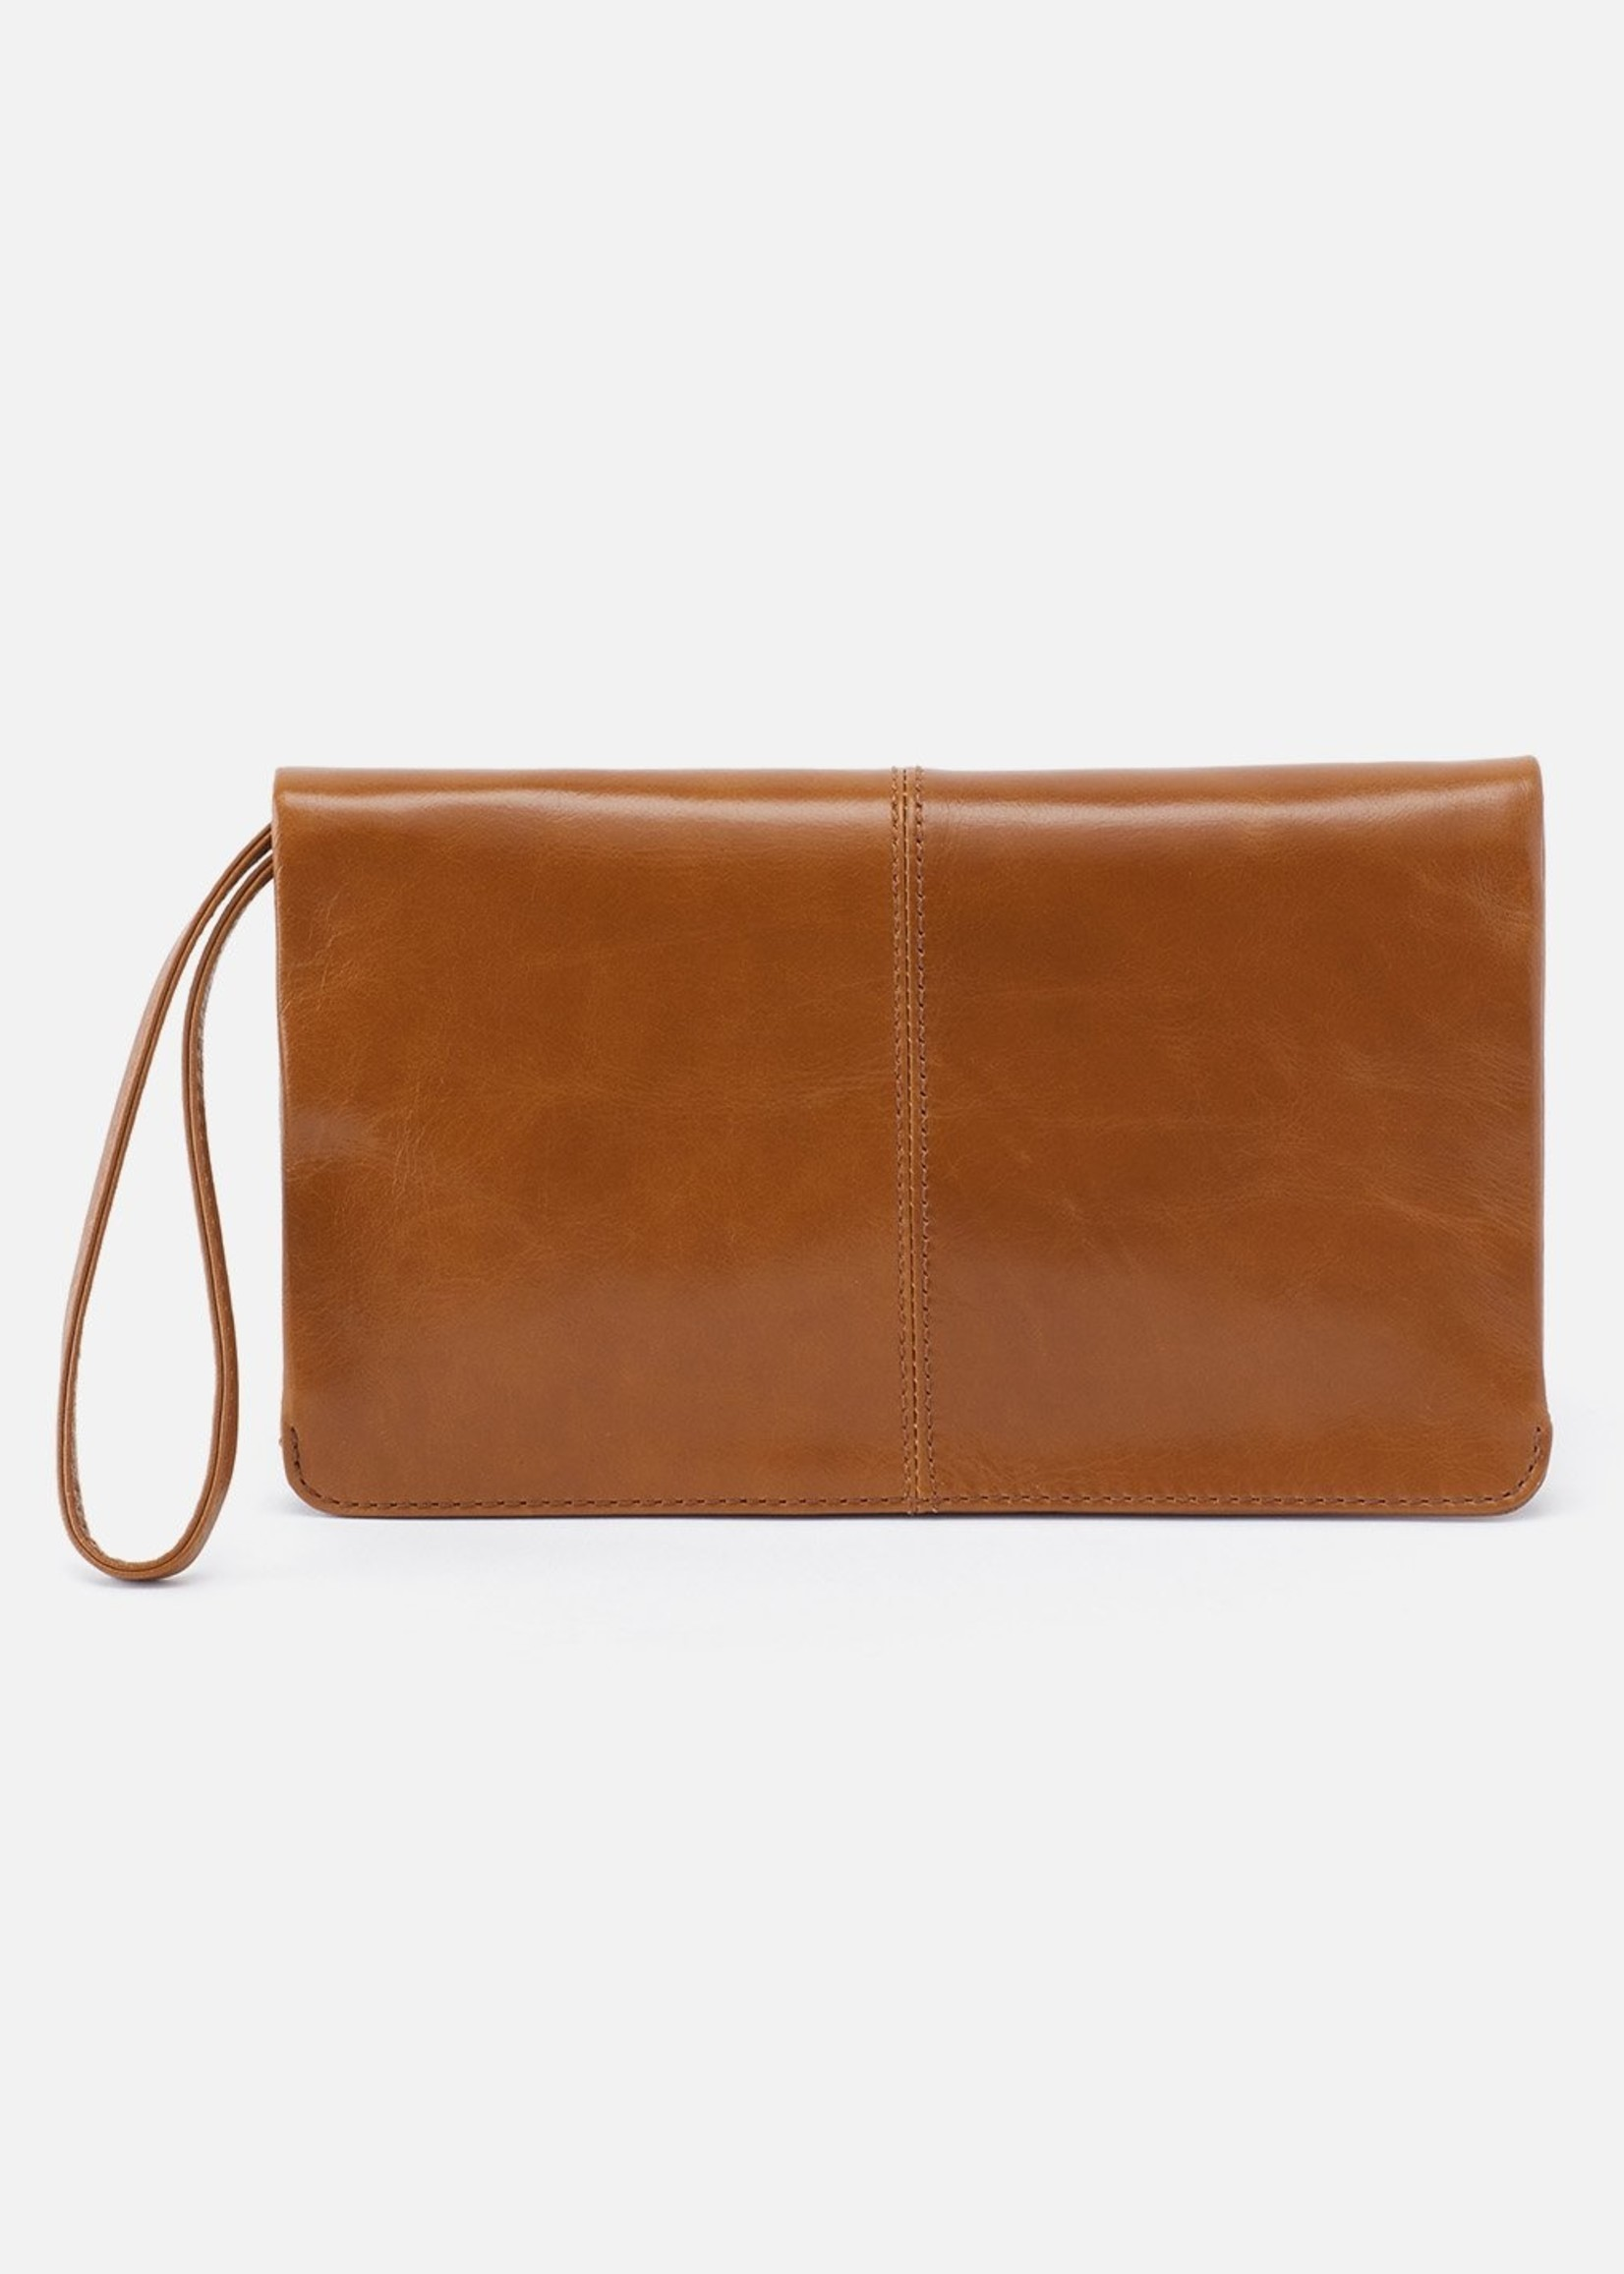 HOBO Bags Evolve Wristlet Truffle